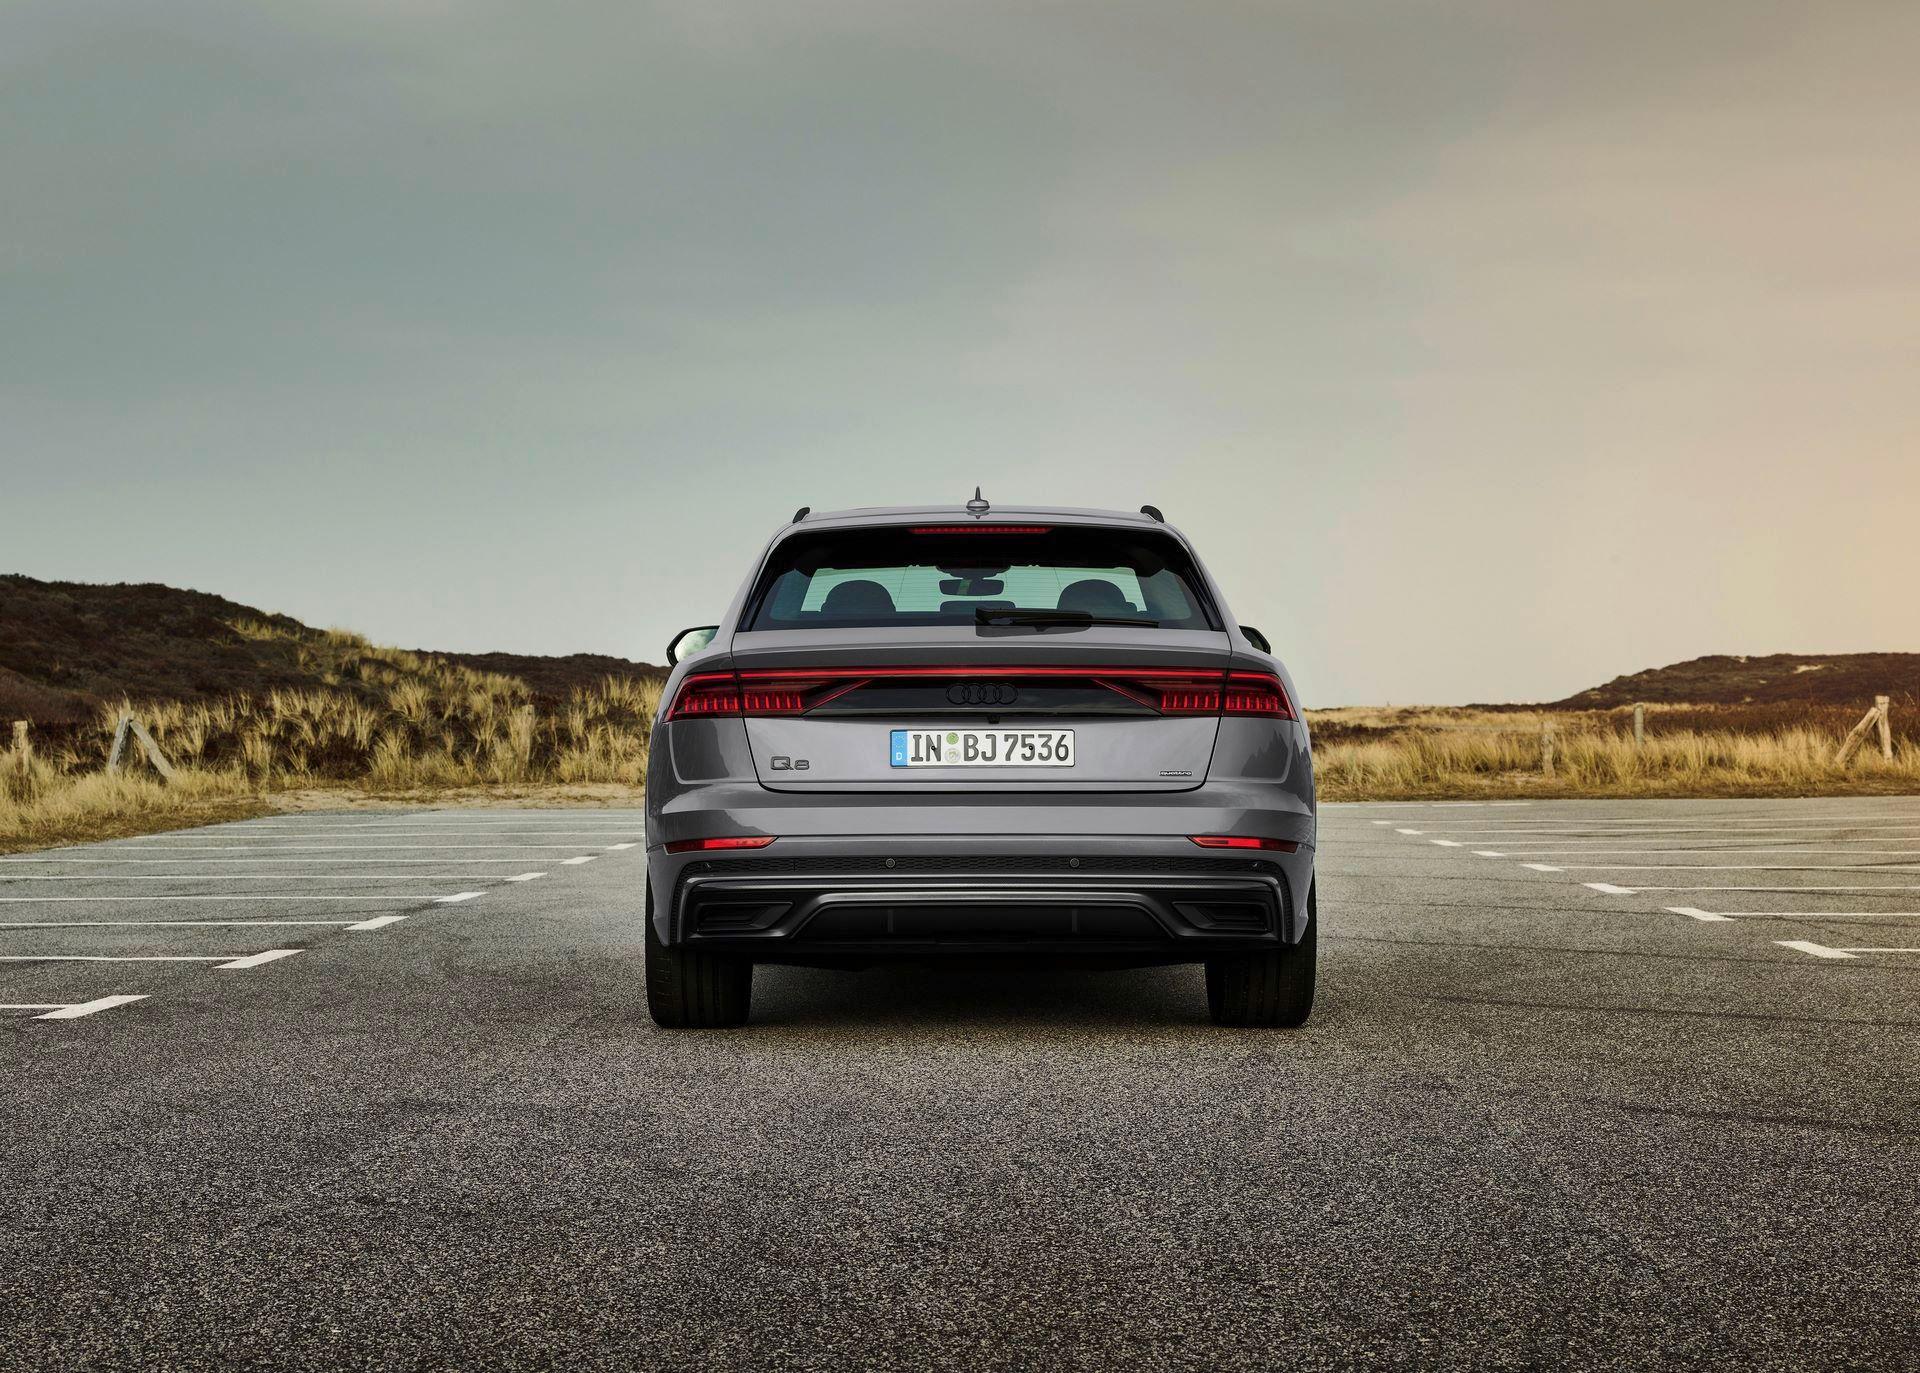 Audi-A4-A5-Q7-Q8-Competition-And-Competition-Plus-Trims-15